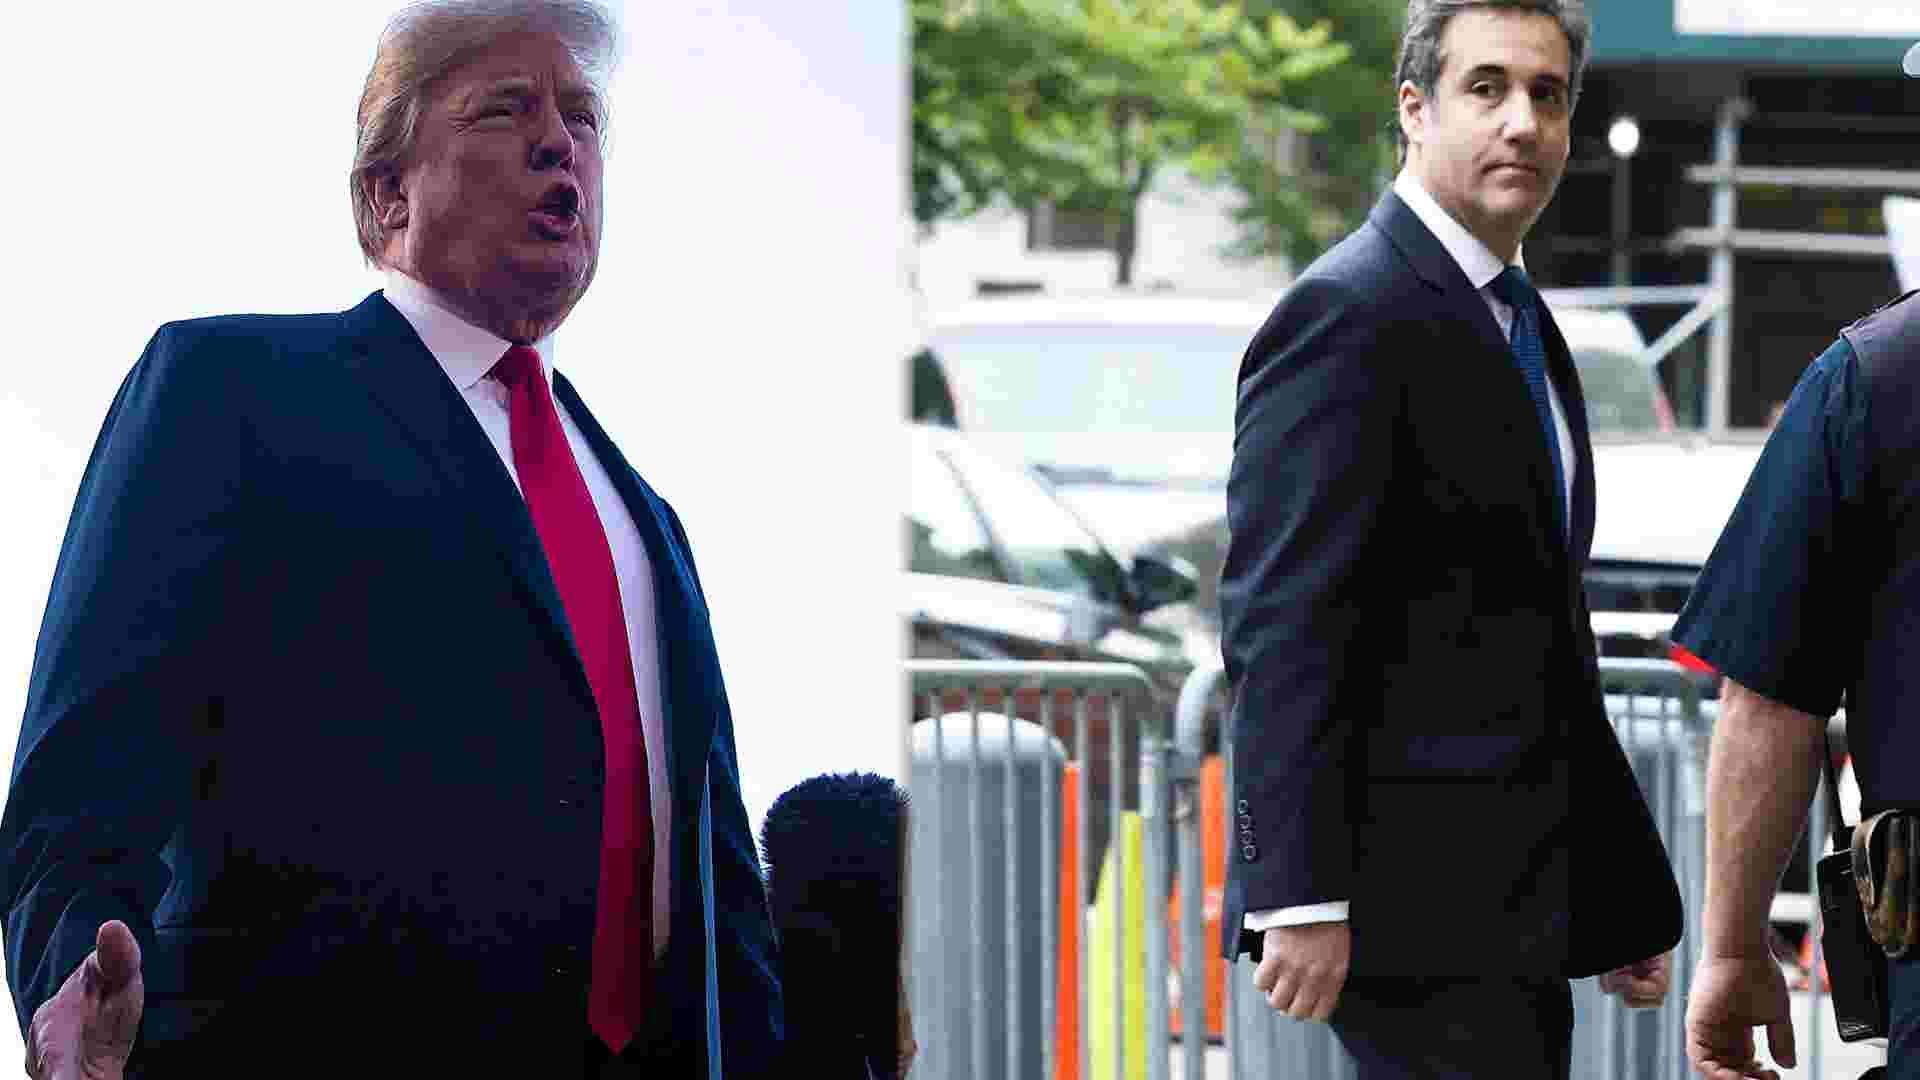 Rudy Giuliani Former Trump Fixer Michael Cohen Is Pathological Liar